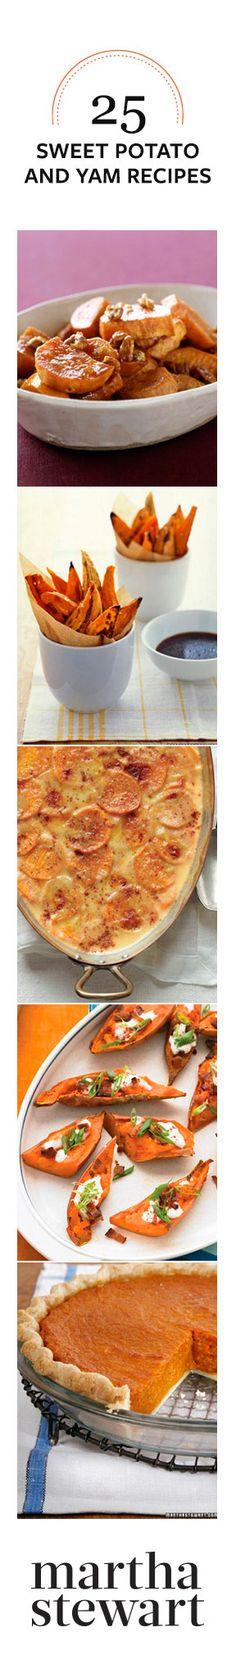 Martha Stewart: 25 Sweet Potato and Yam Recipes Sweet Potato Recipes, Yam Recipes, Cooking Recipes, I Love Food, Good Food, Yummy Food, Thanksgiving Recipes, Holiday Recipes, Carne